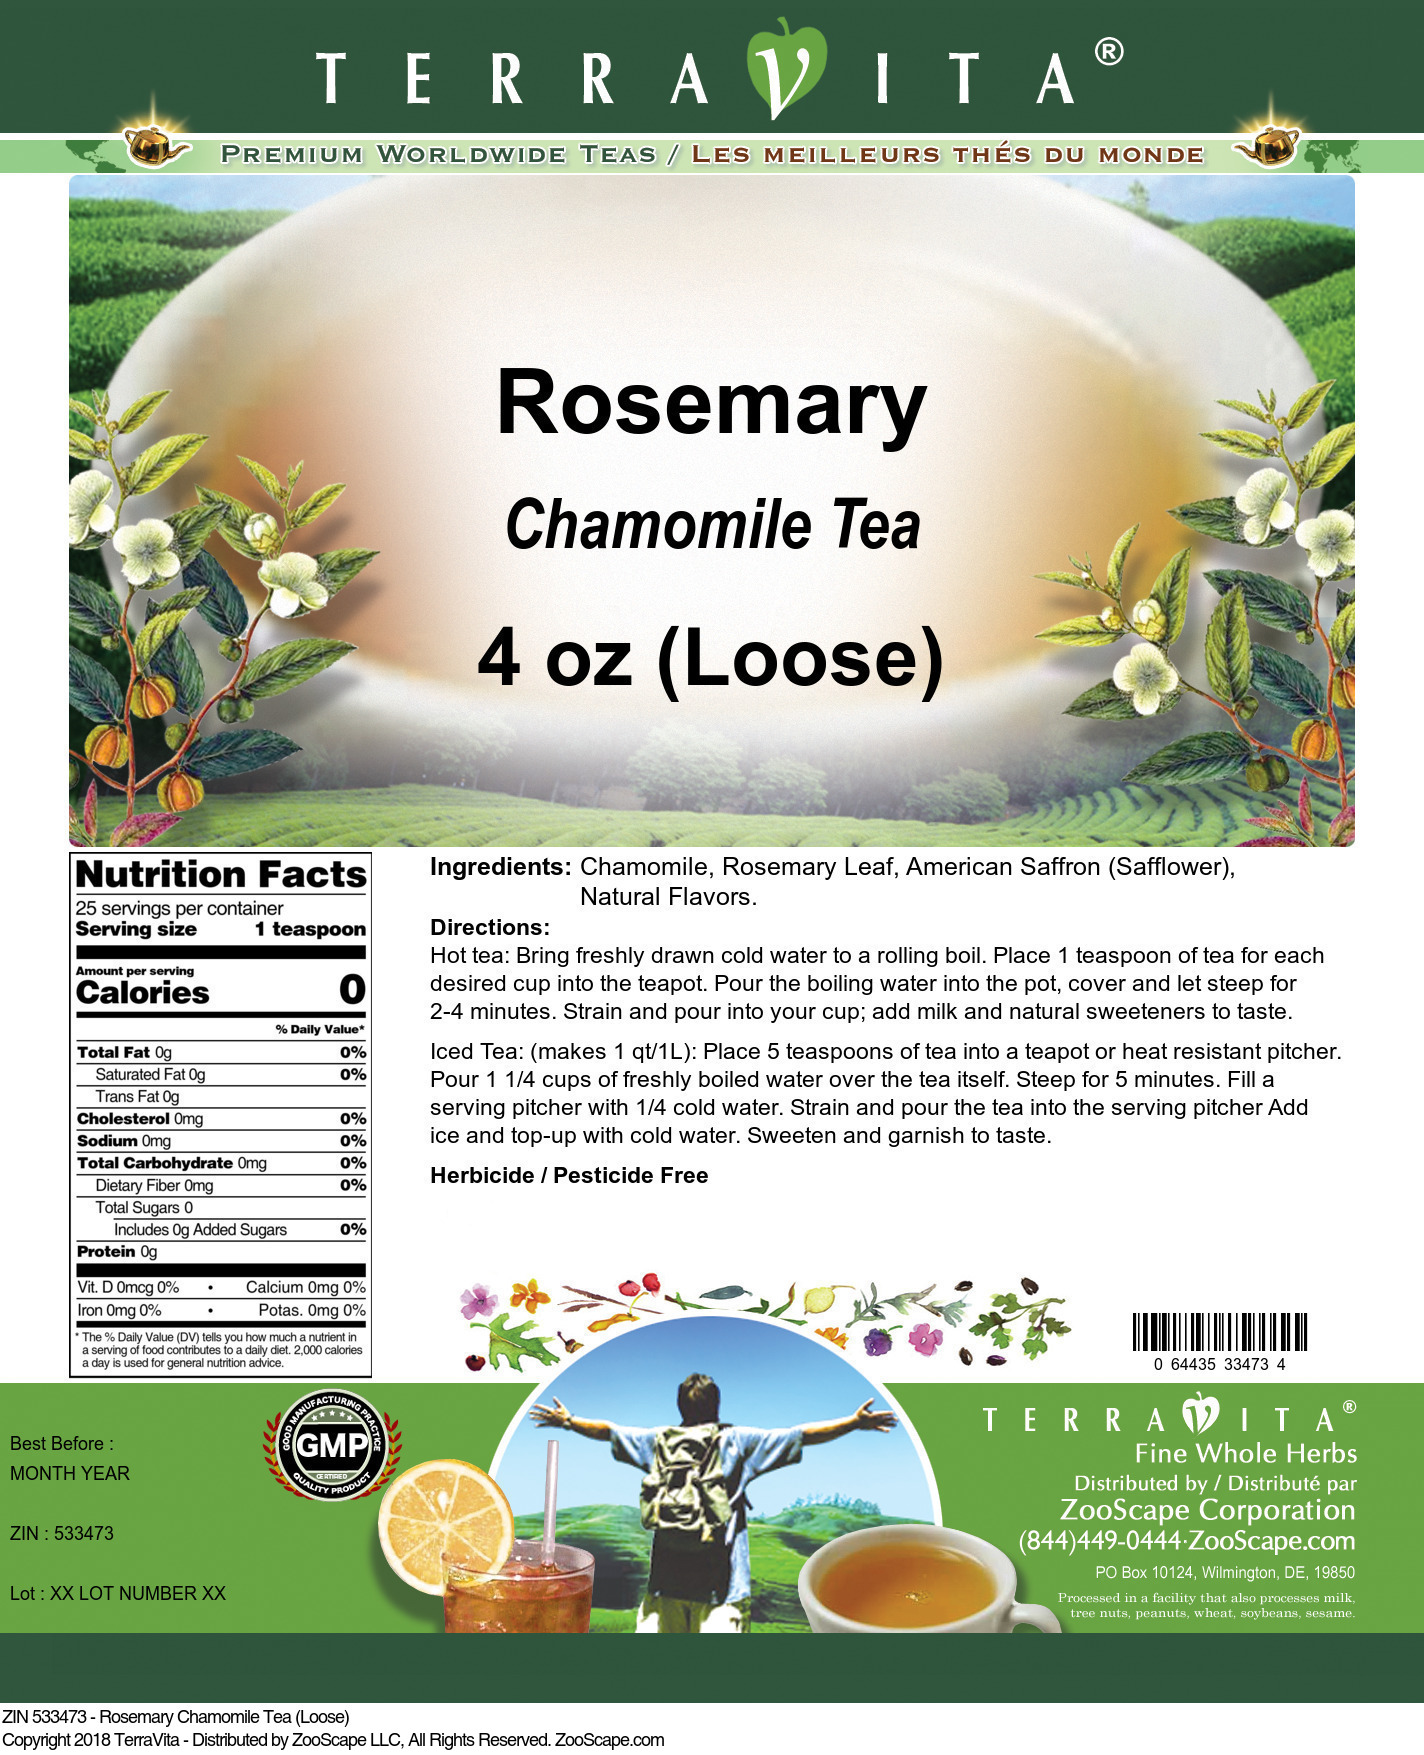 Rosemary Chamomile Tea